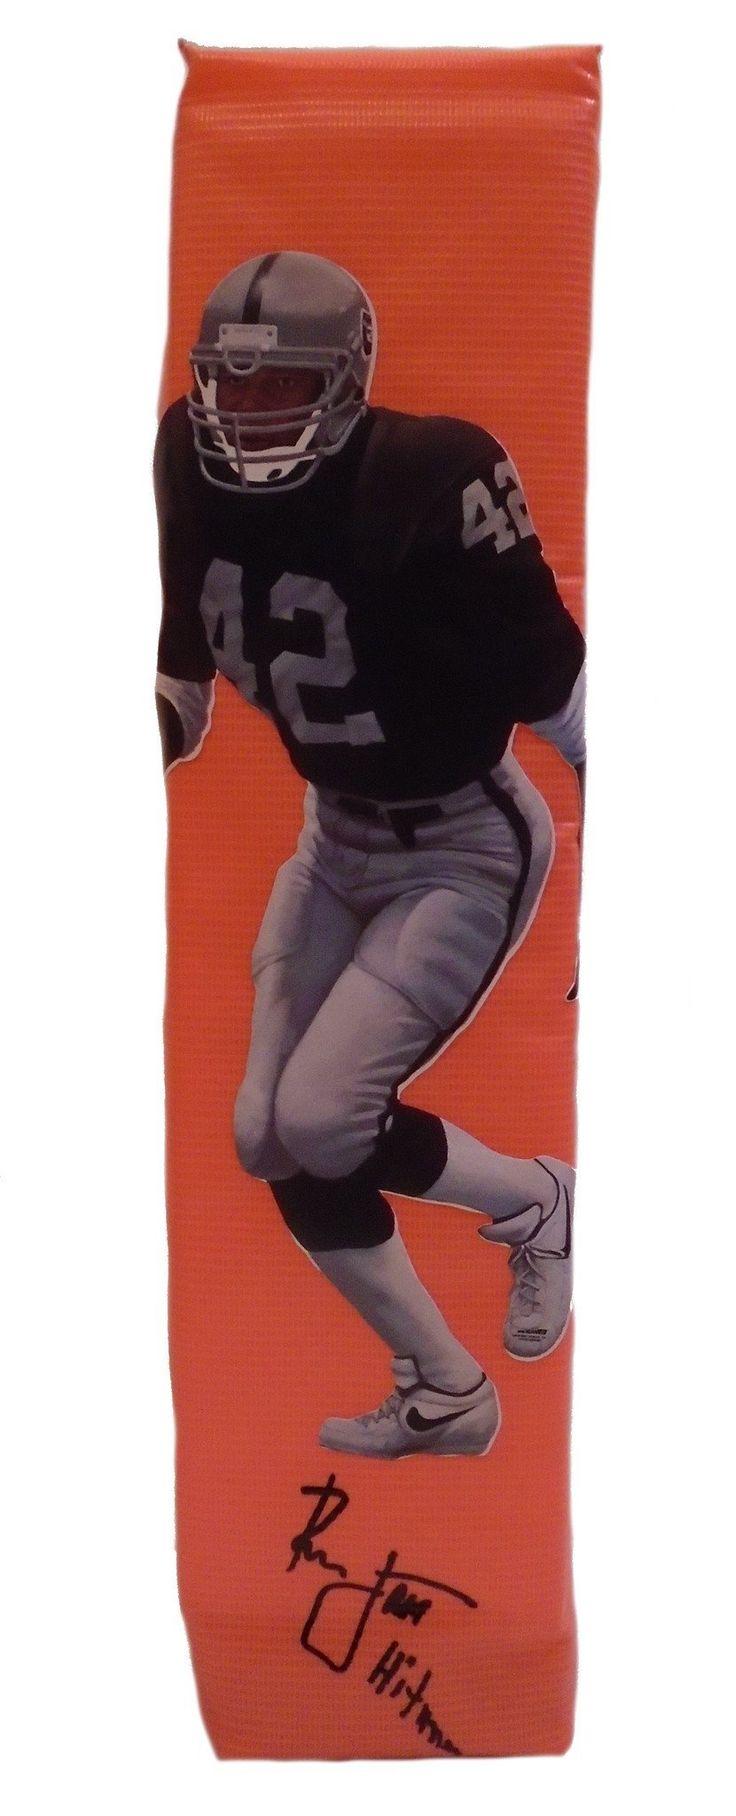 Ronnie Lott Autographed LA Raiders Photo Full Size Football End Zone Touchdown Pylon, Proof